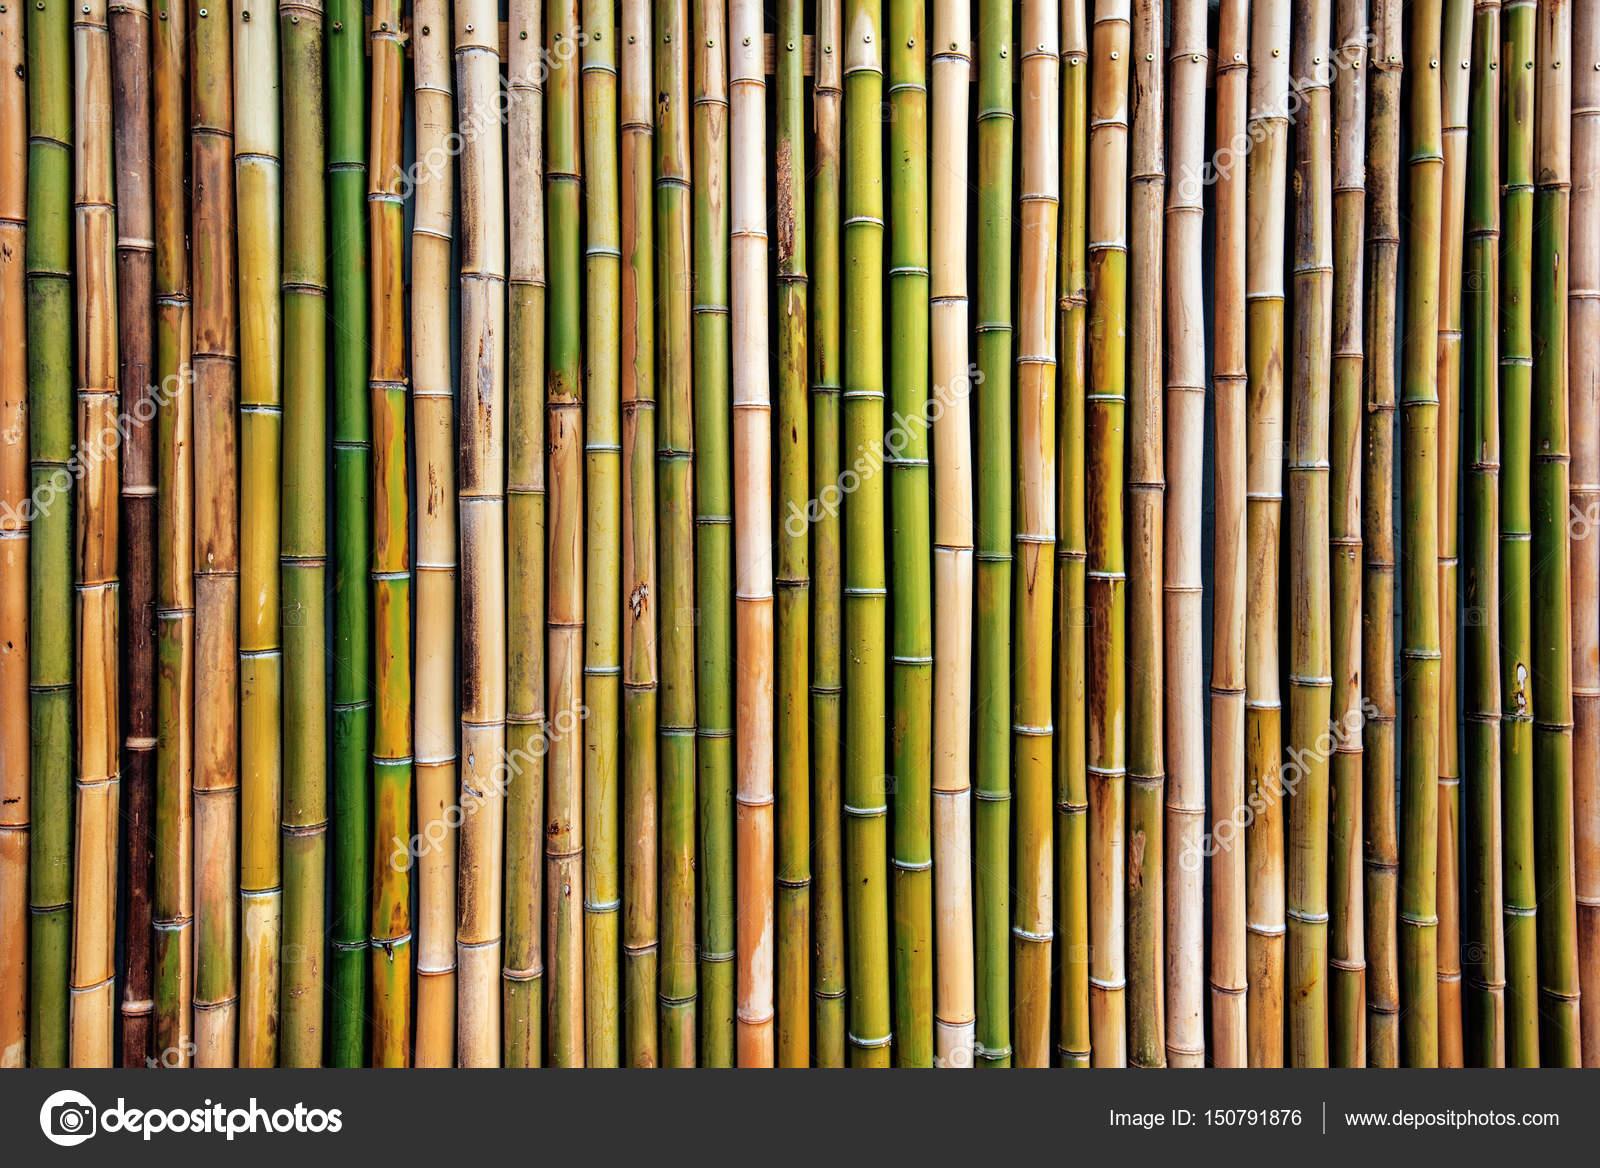 Trockenen Bambus Baum Zaun Wand Hintergrund Stockfoto